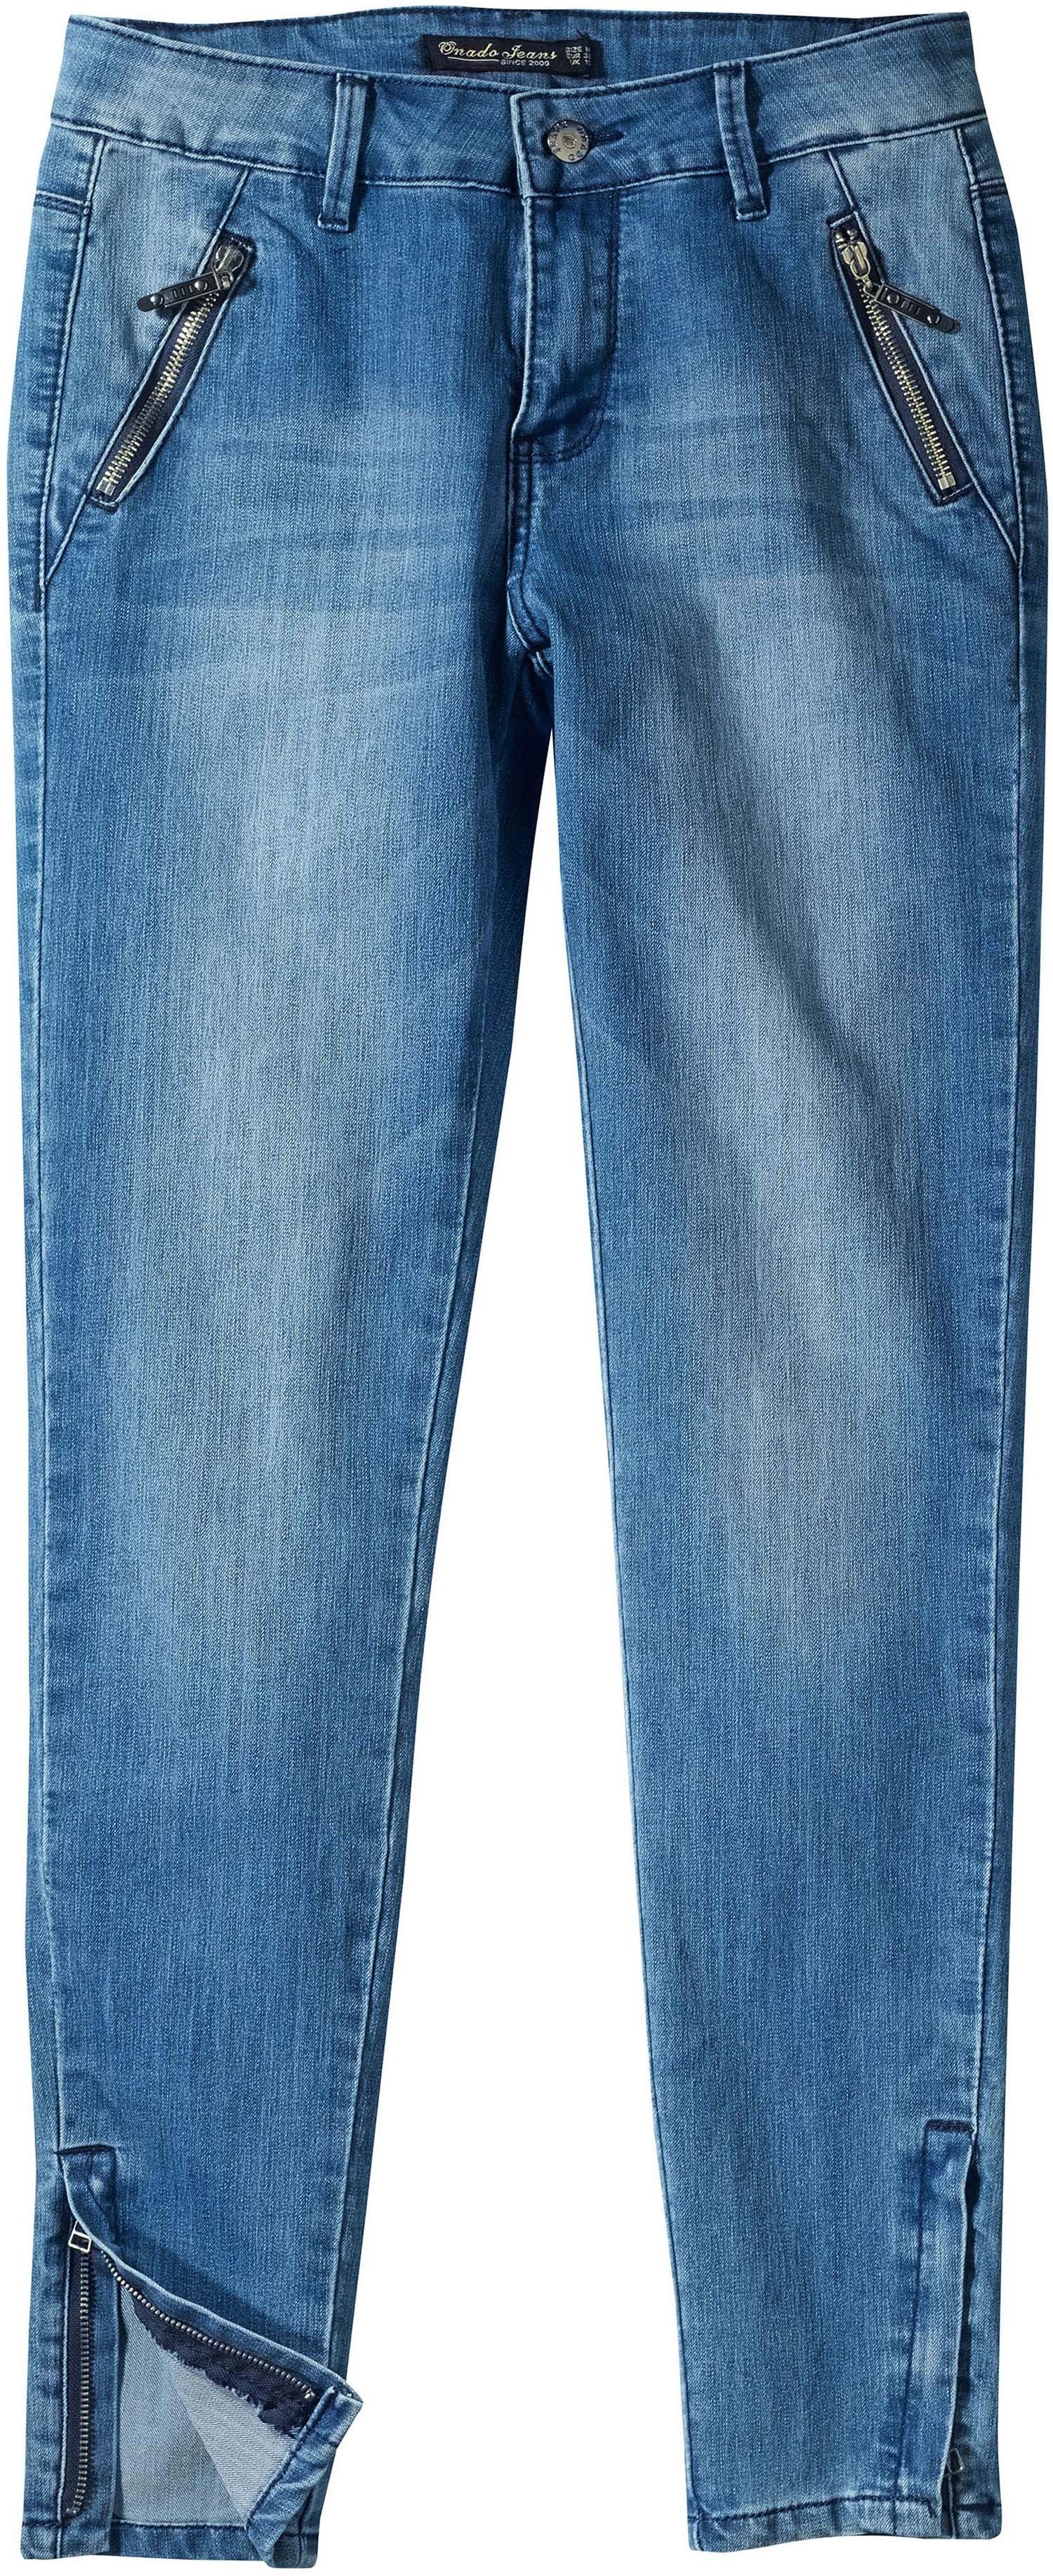 D-Str.Jeans,Reissv.Blue Denim L 050 - 1 - Ronja.ch